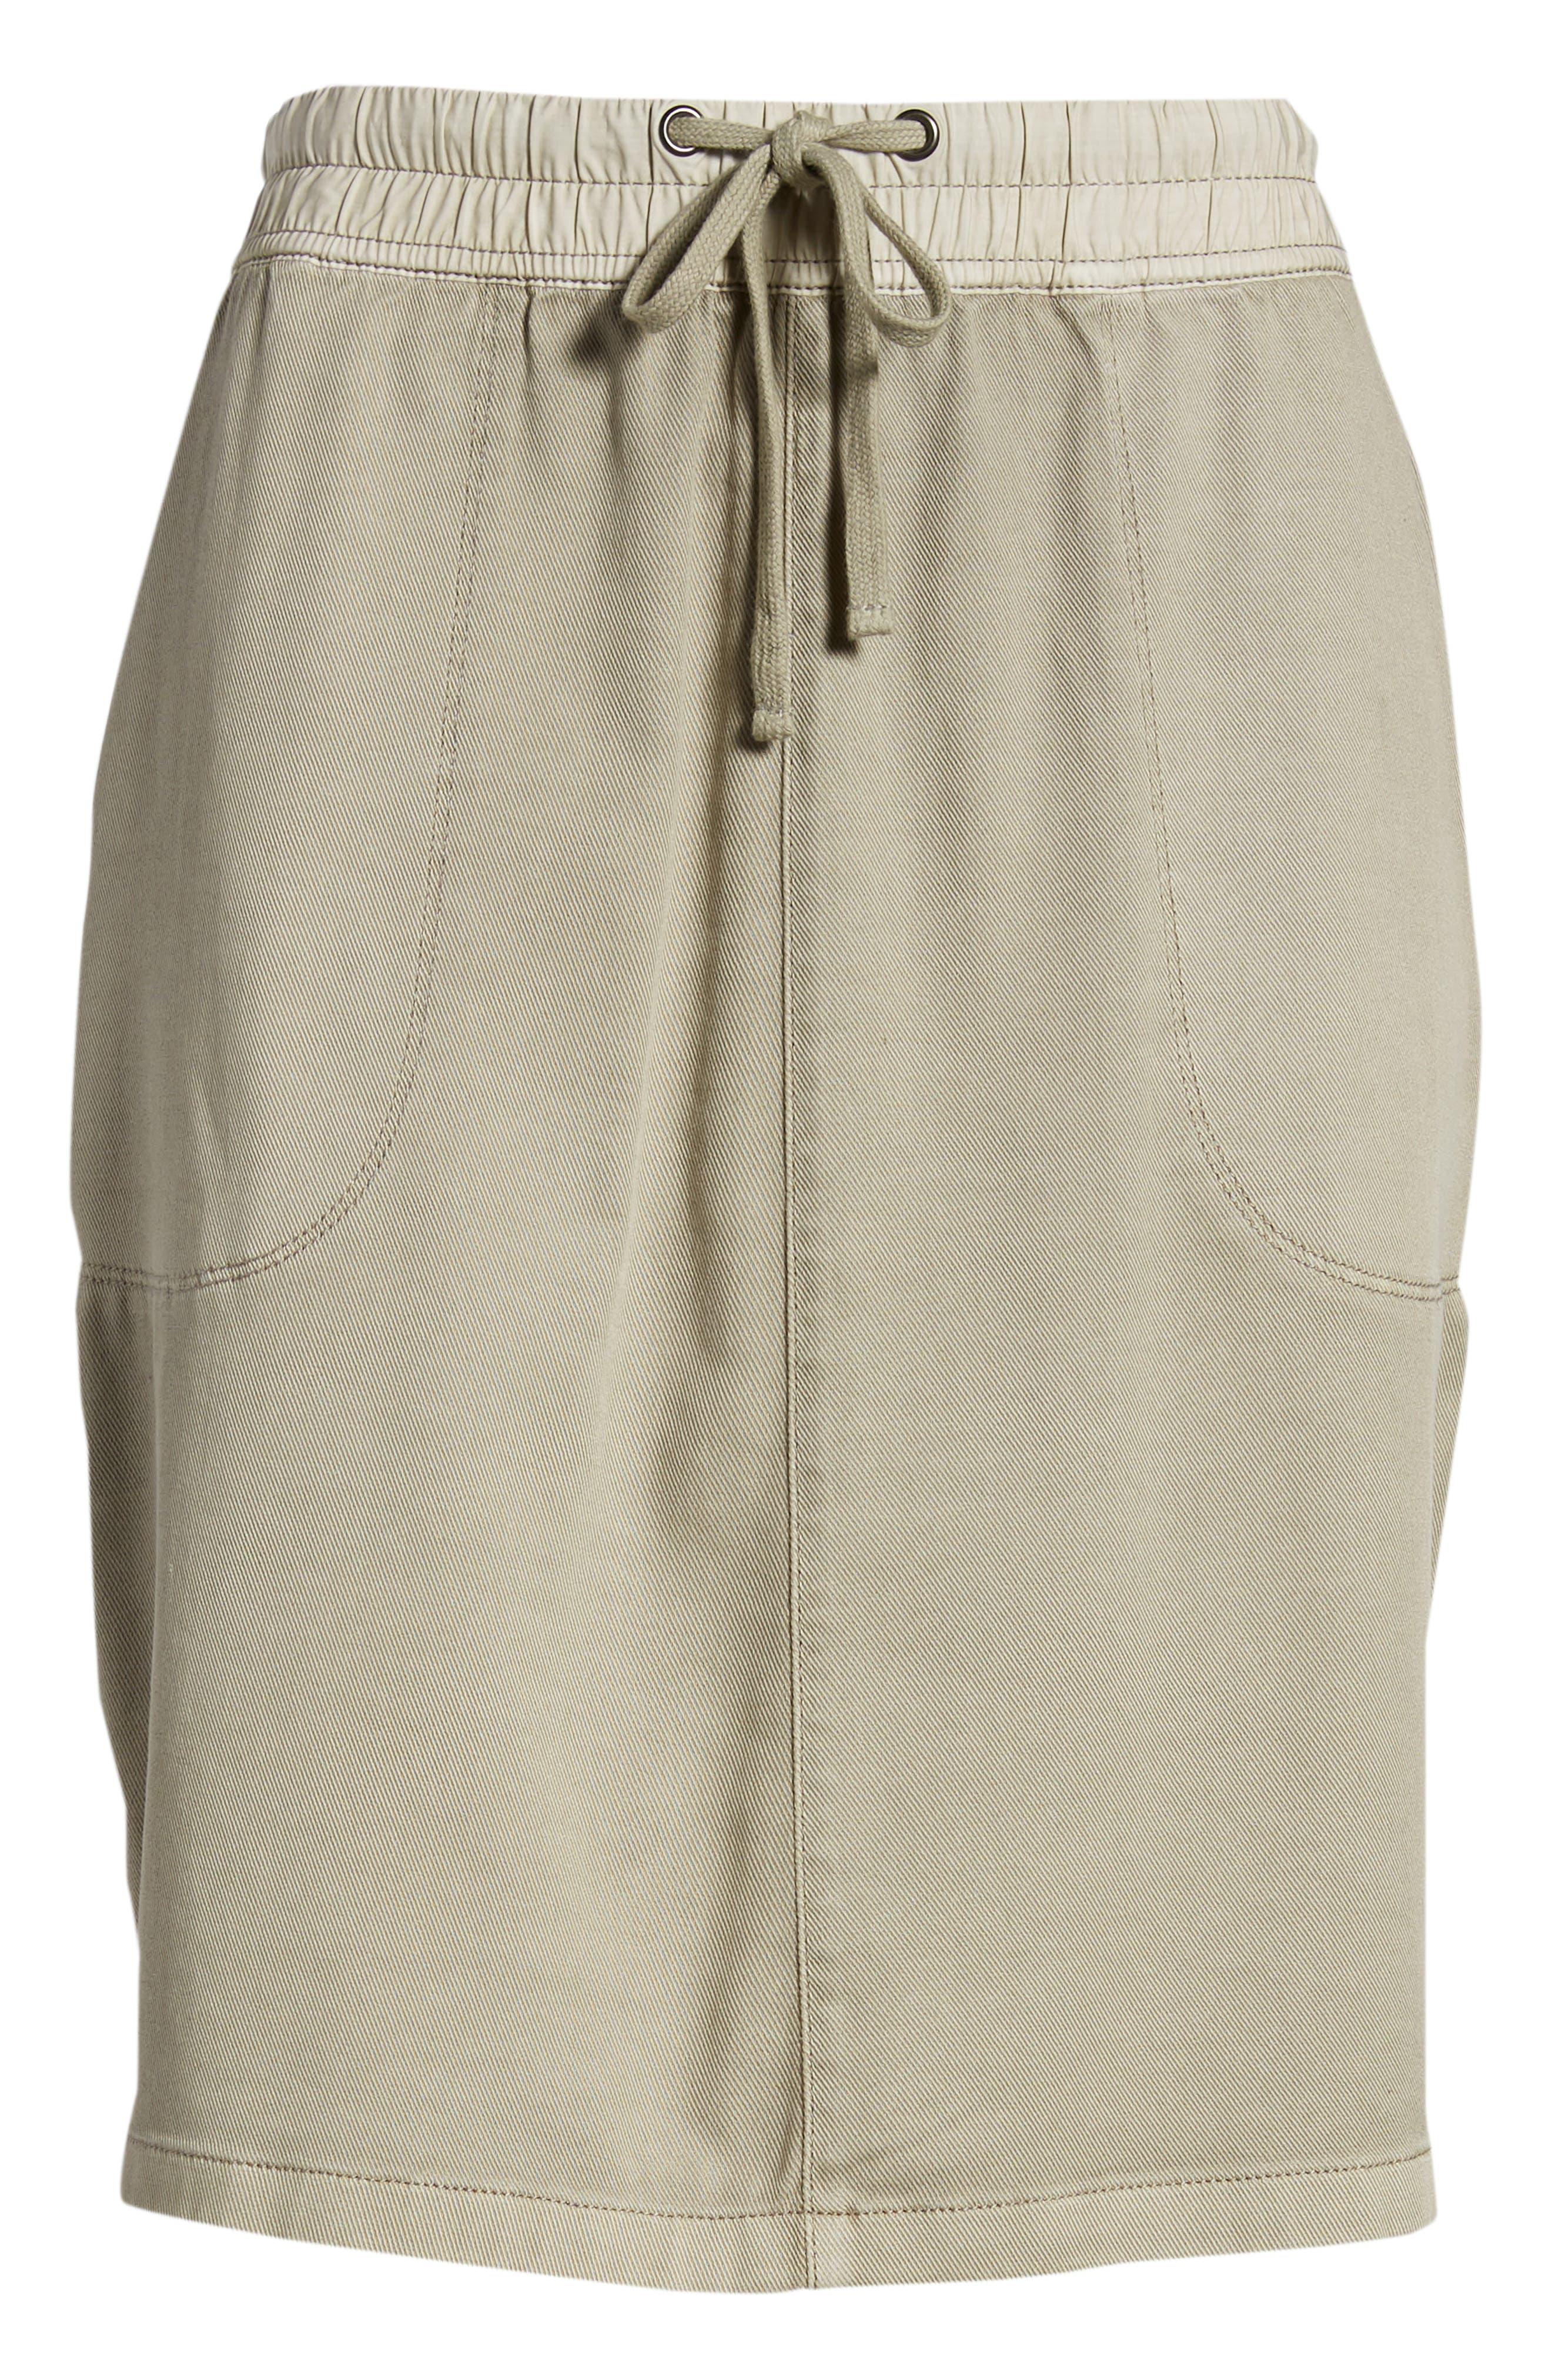 Open Road Skirt,                             Alternate thumbnail 6, color,                             FLAX